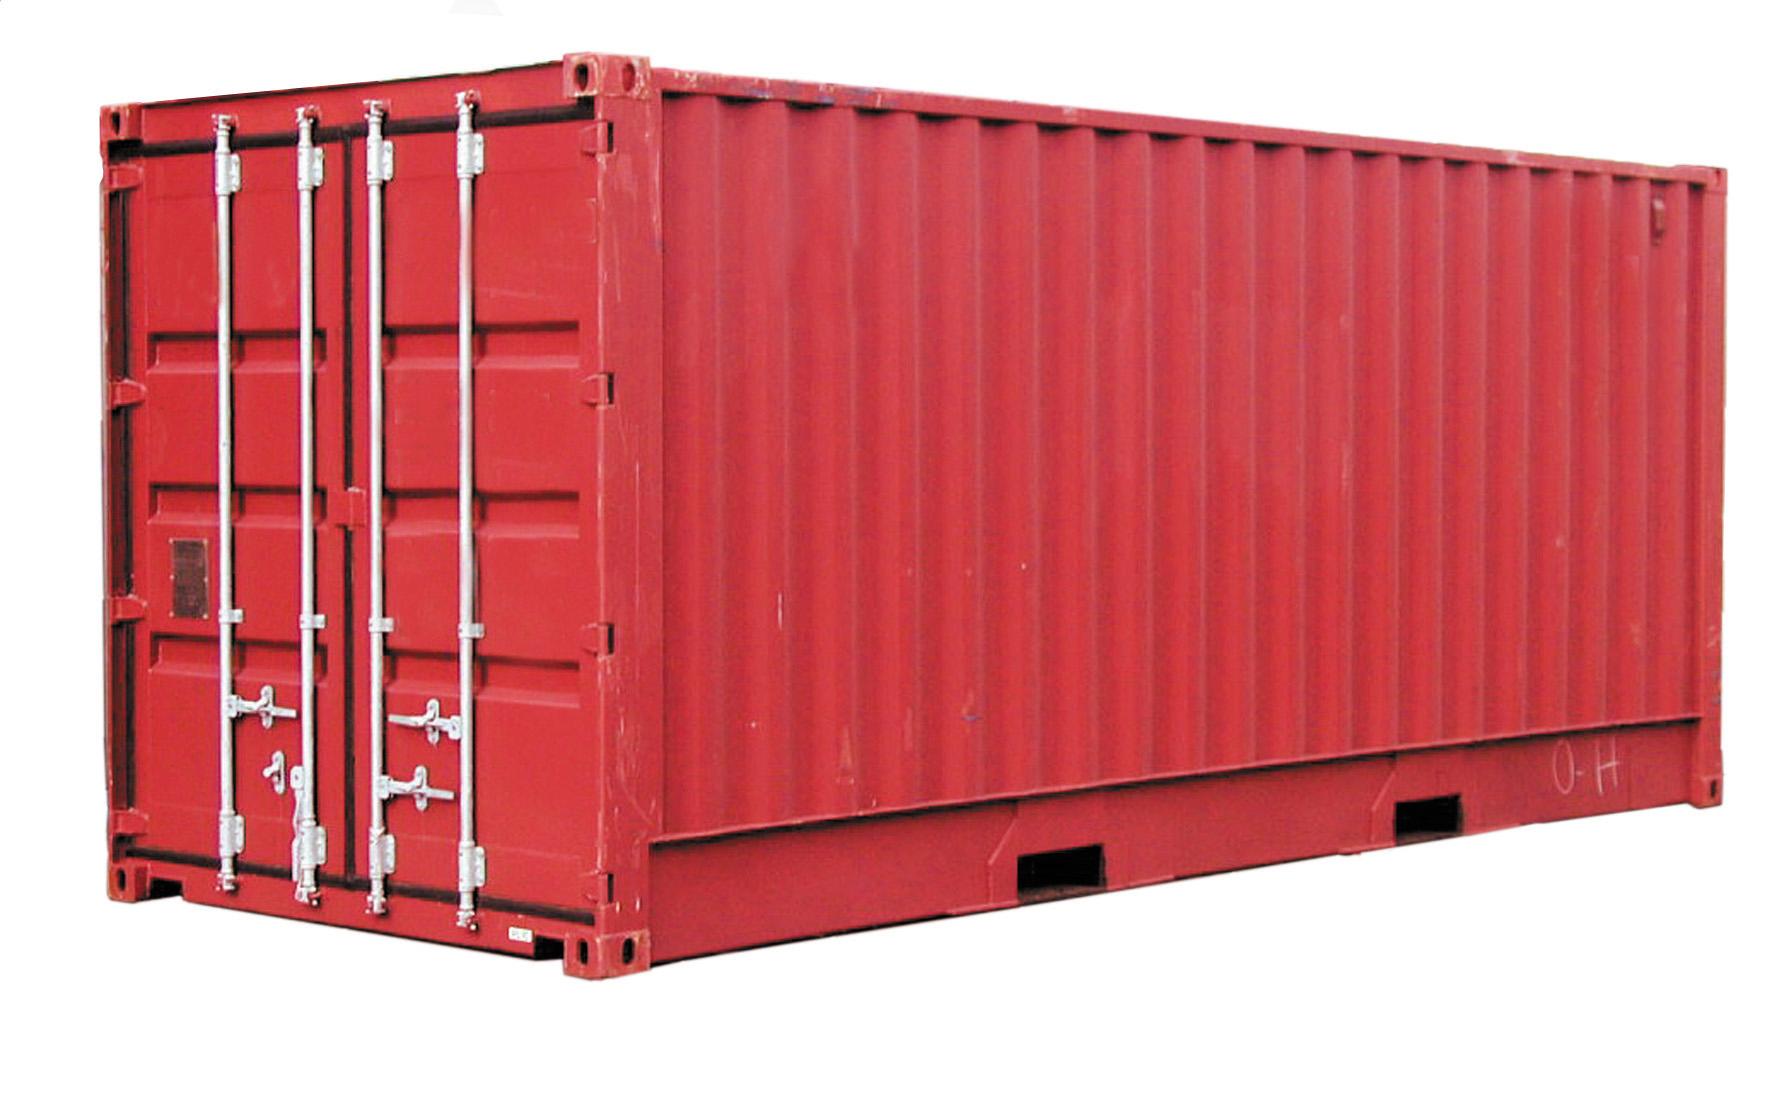 Svenska folkets dr mhus r inte en r d container stefan for Container en